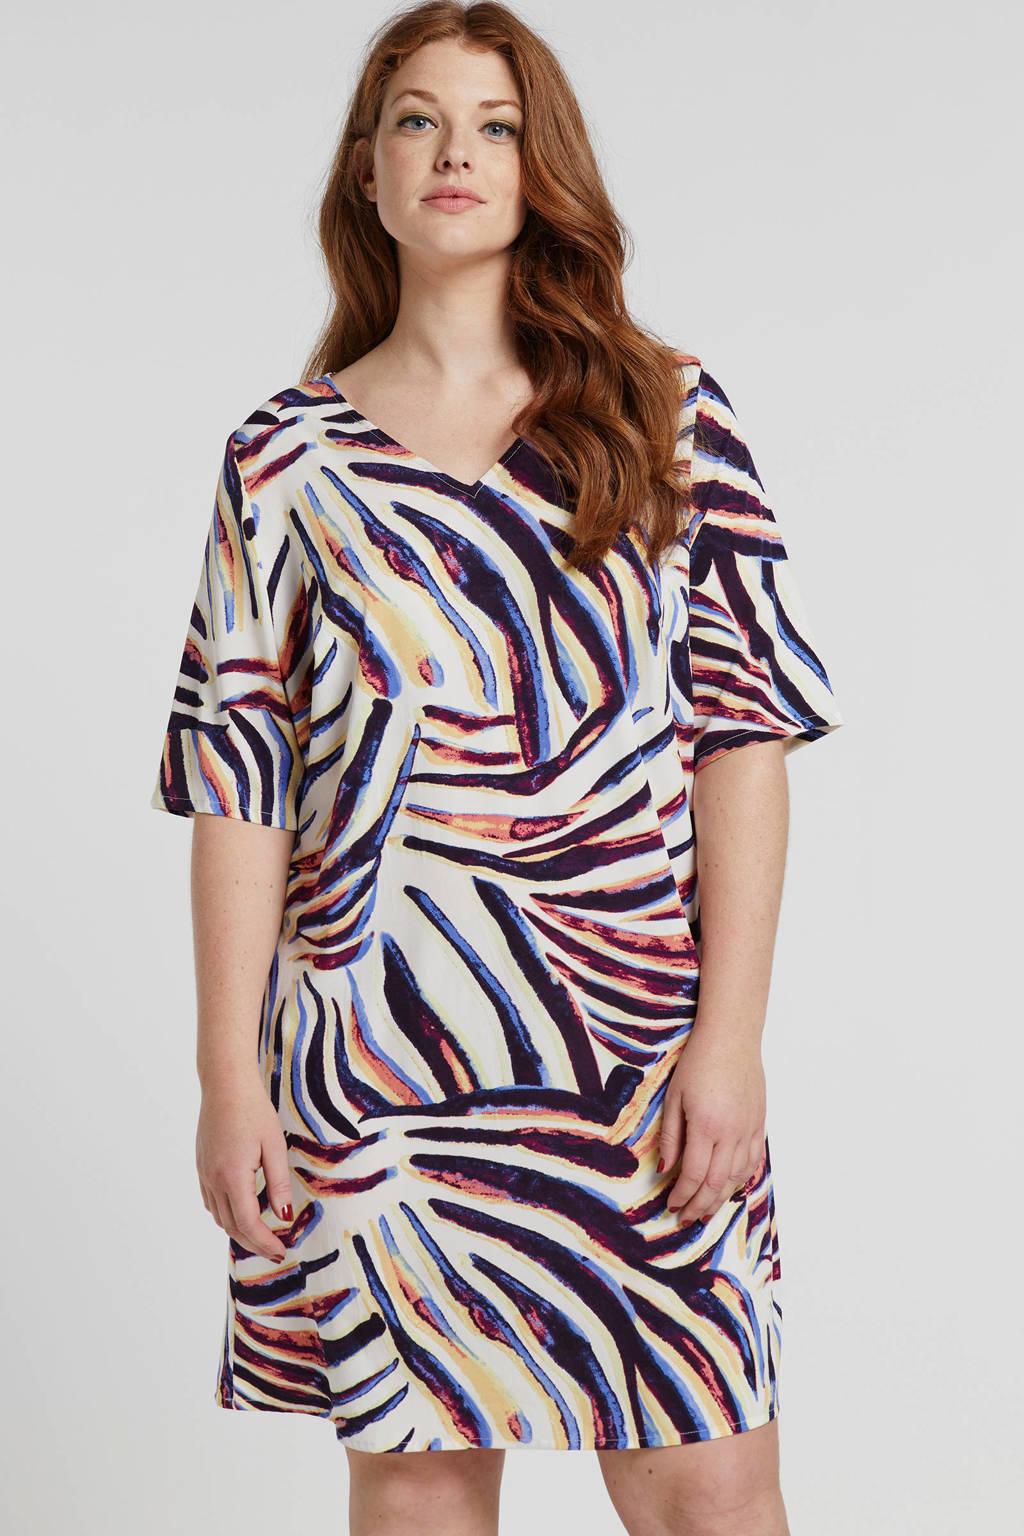 JUNAROSE jurk met all over print, Beige/multi